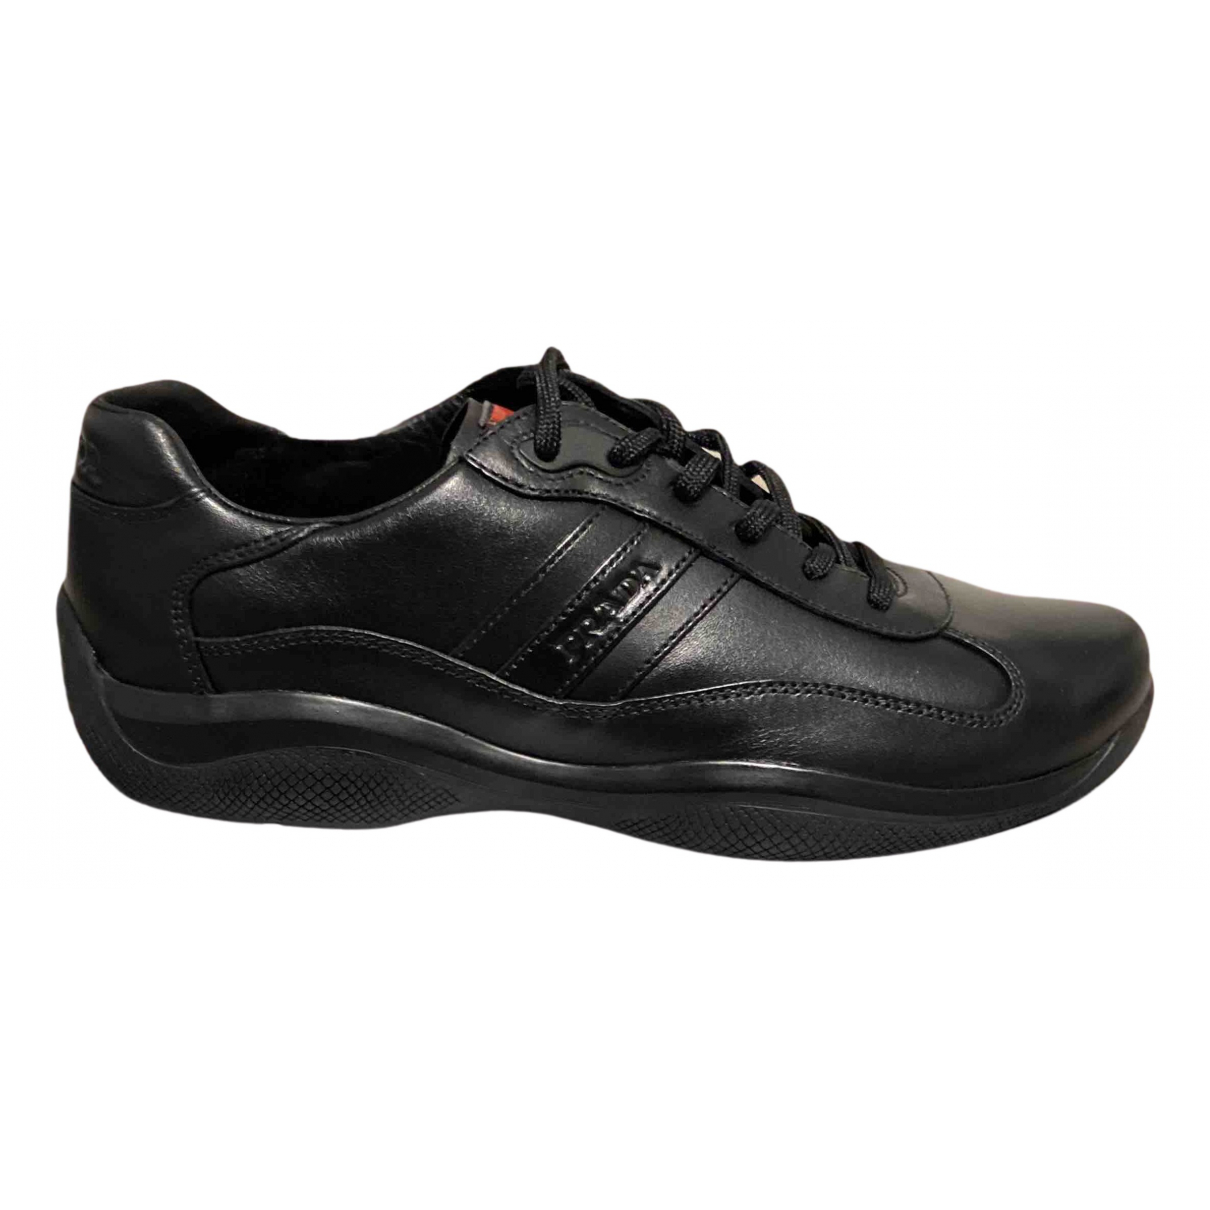 Prada N Black Leather Trainers for Men 39 EU